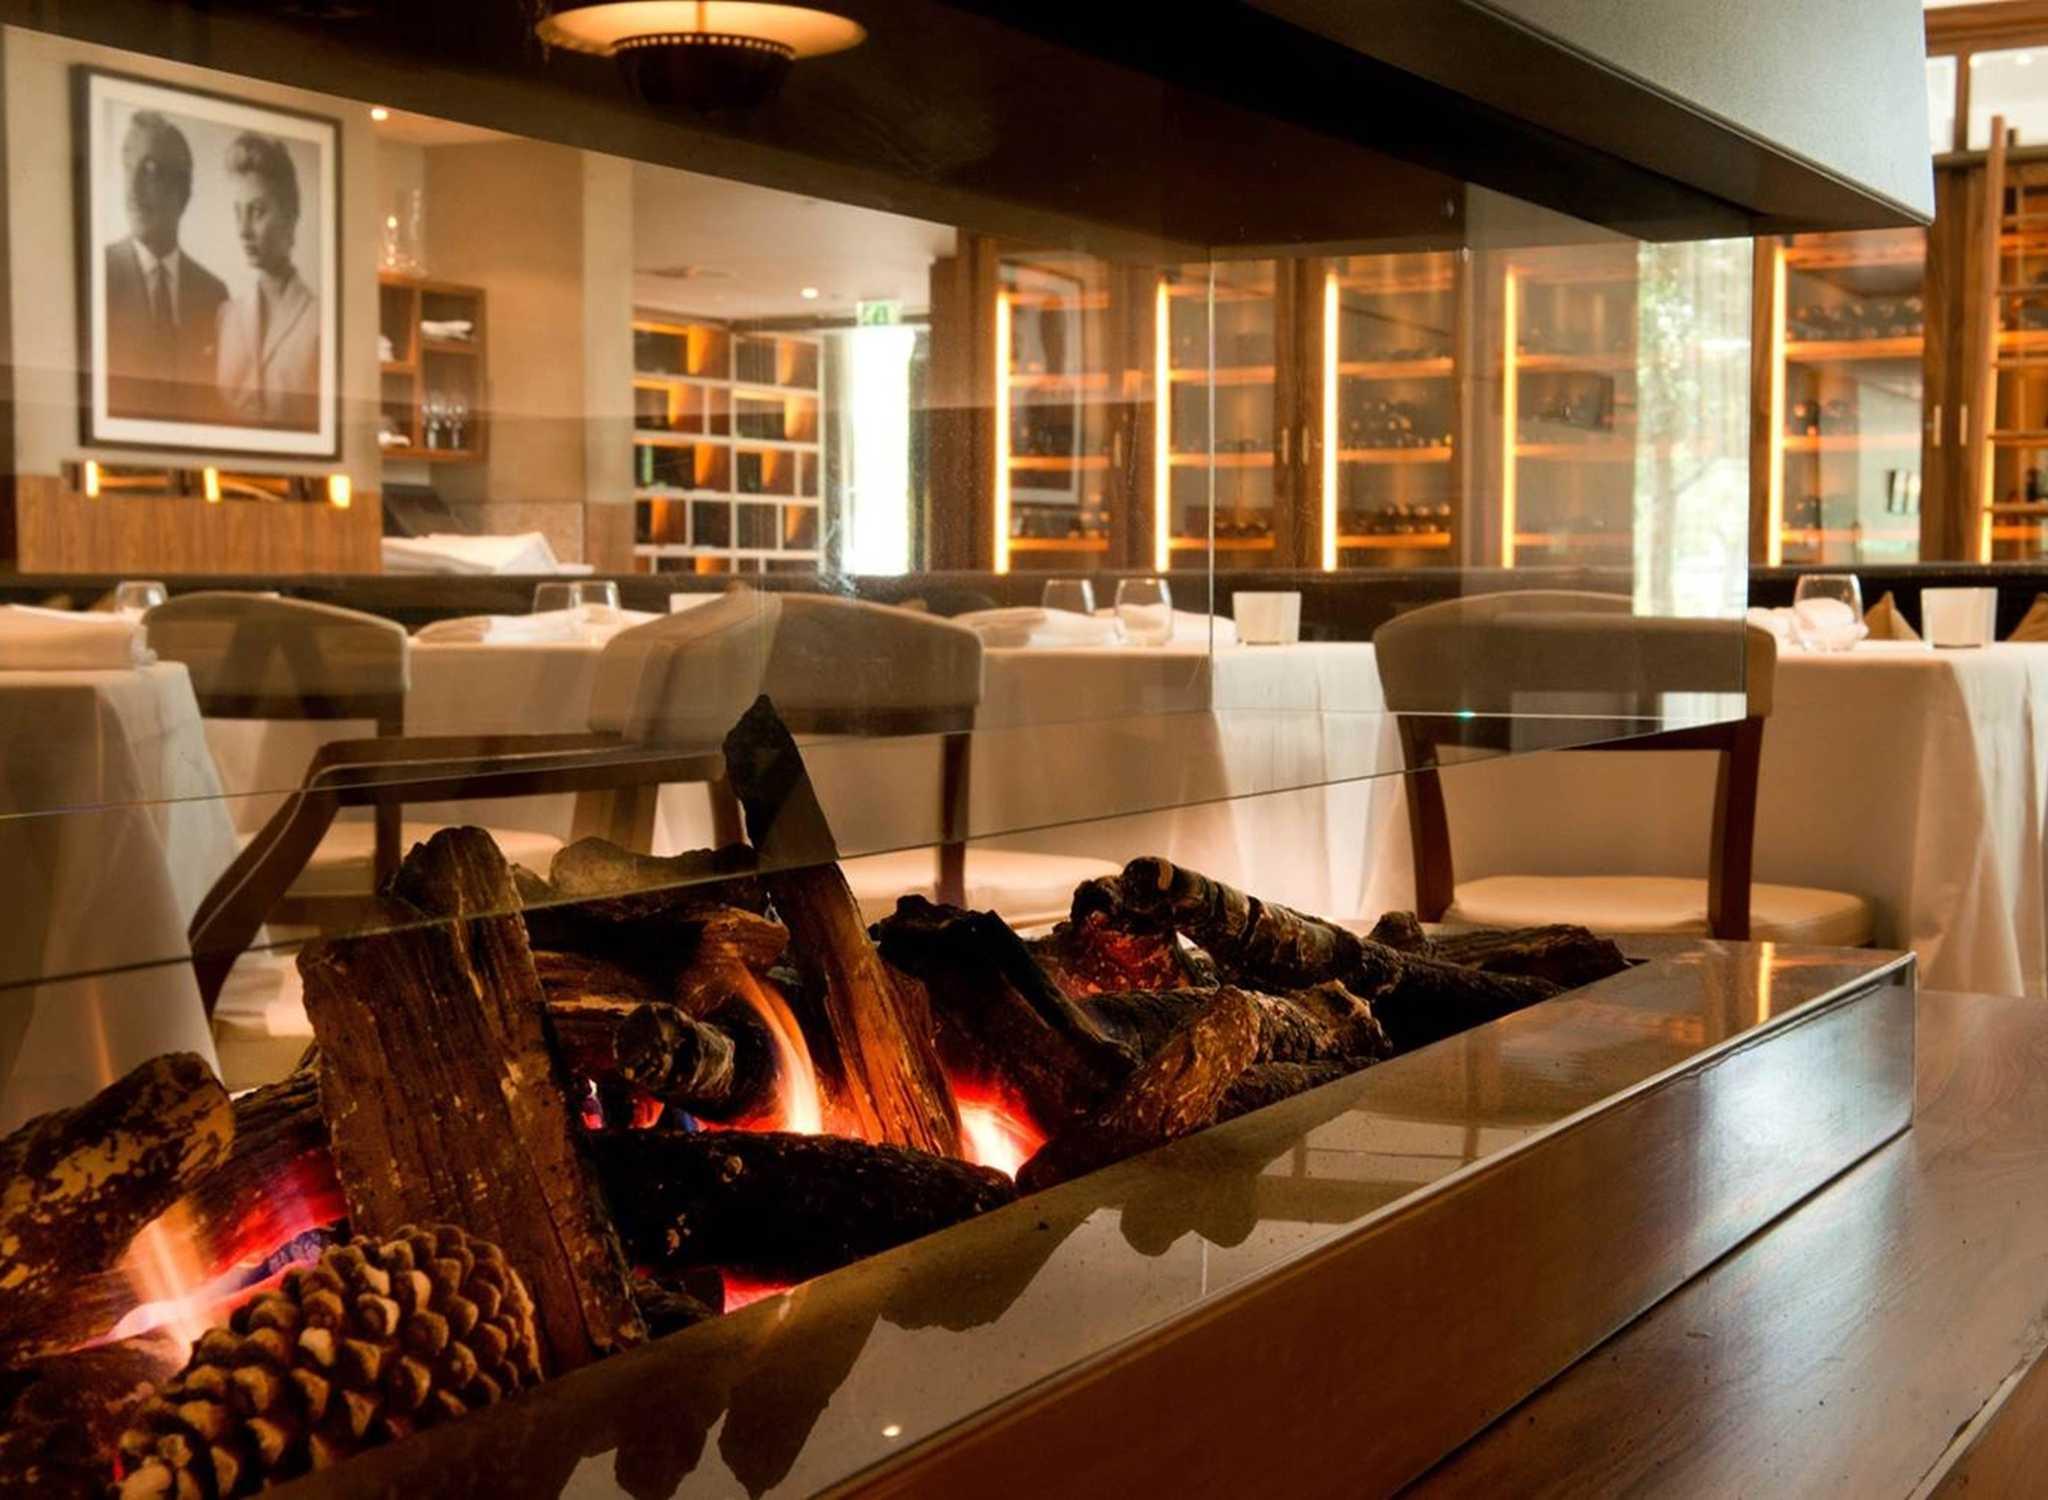 Amshitw_quicklook_full_robertosrestaurant004 Jpg